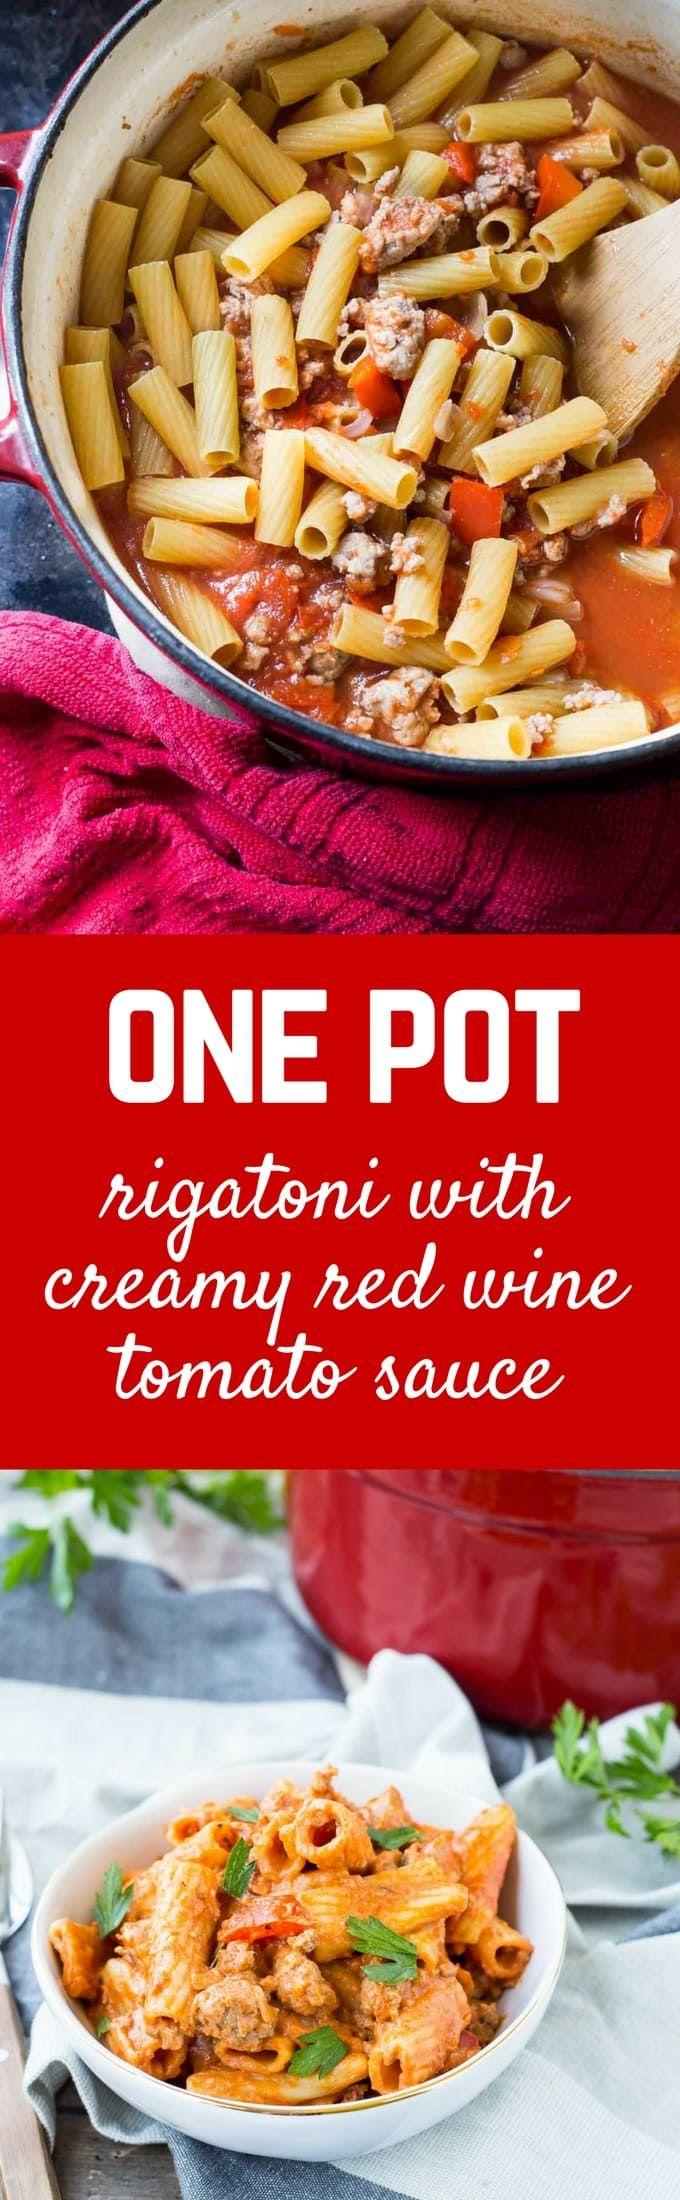 One Pan Rigatoni With Creamy Red Wine Tomato Sauce Recipe Recipes Dinner Dinner Recipes